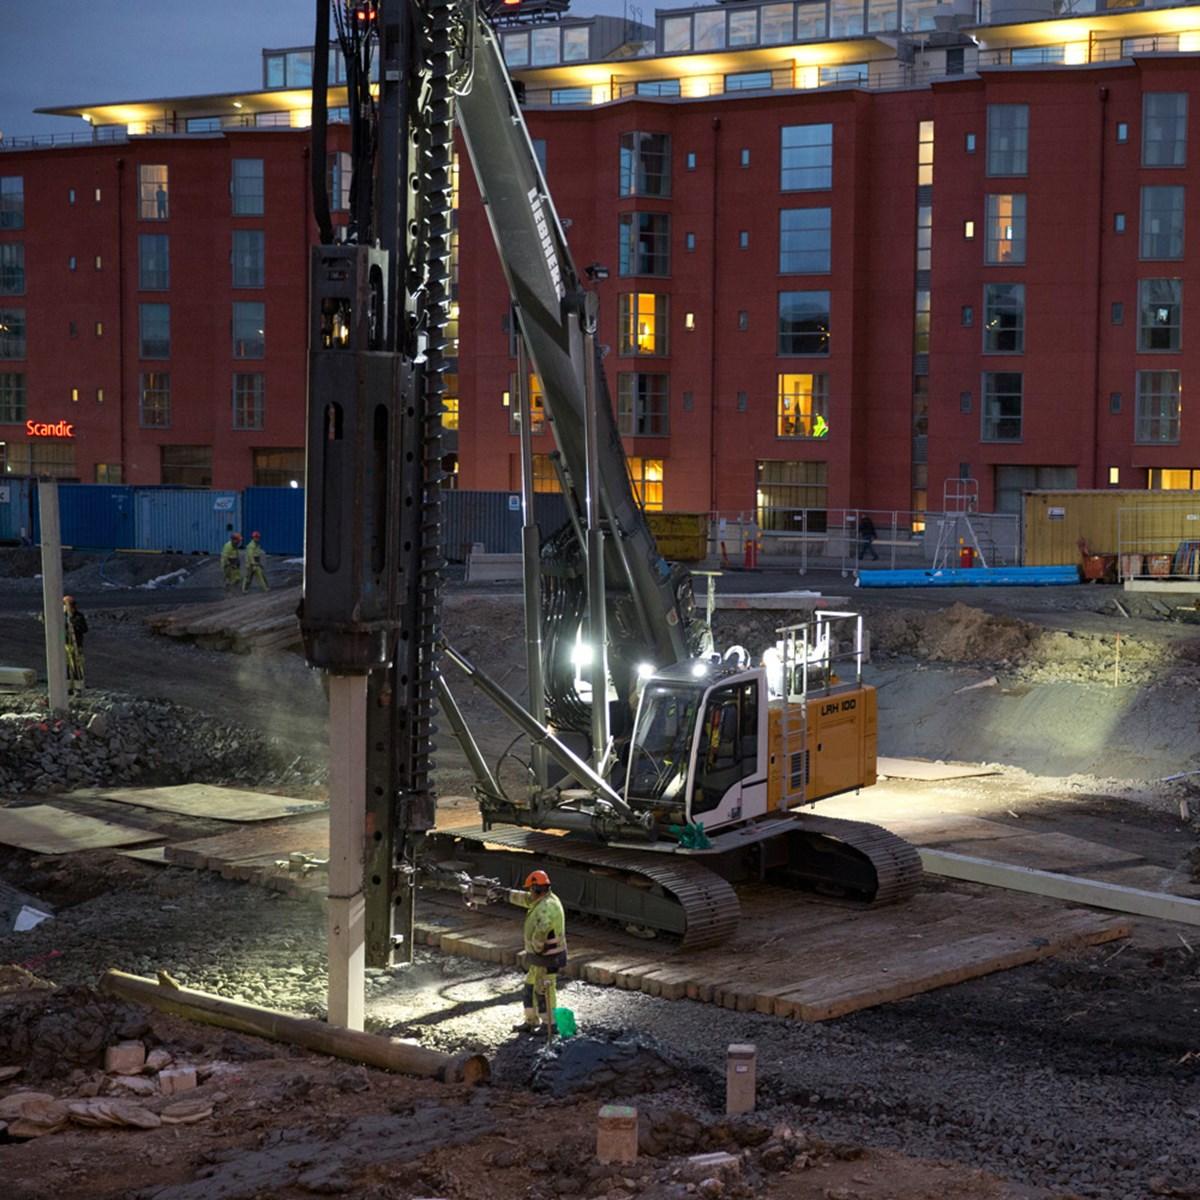 liebherr-lrh-100-piling-rig-concrete-piles-hammer.jpg